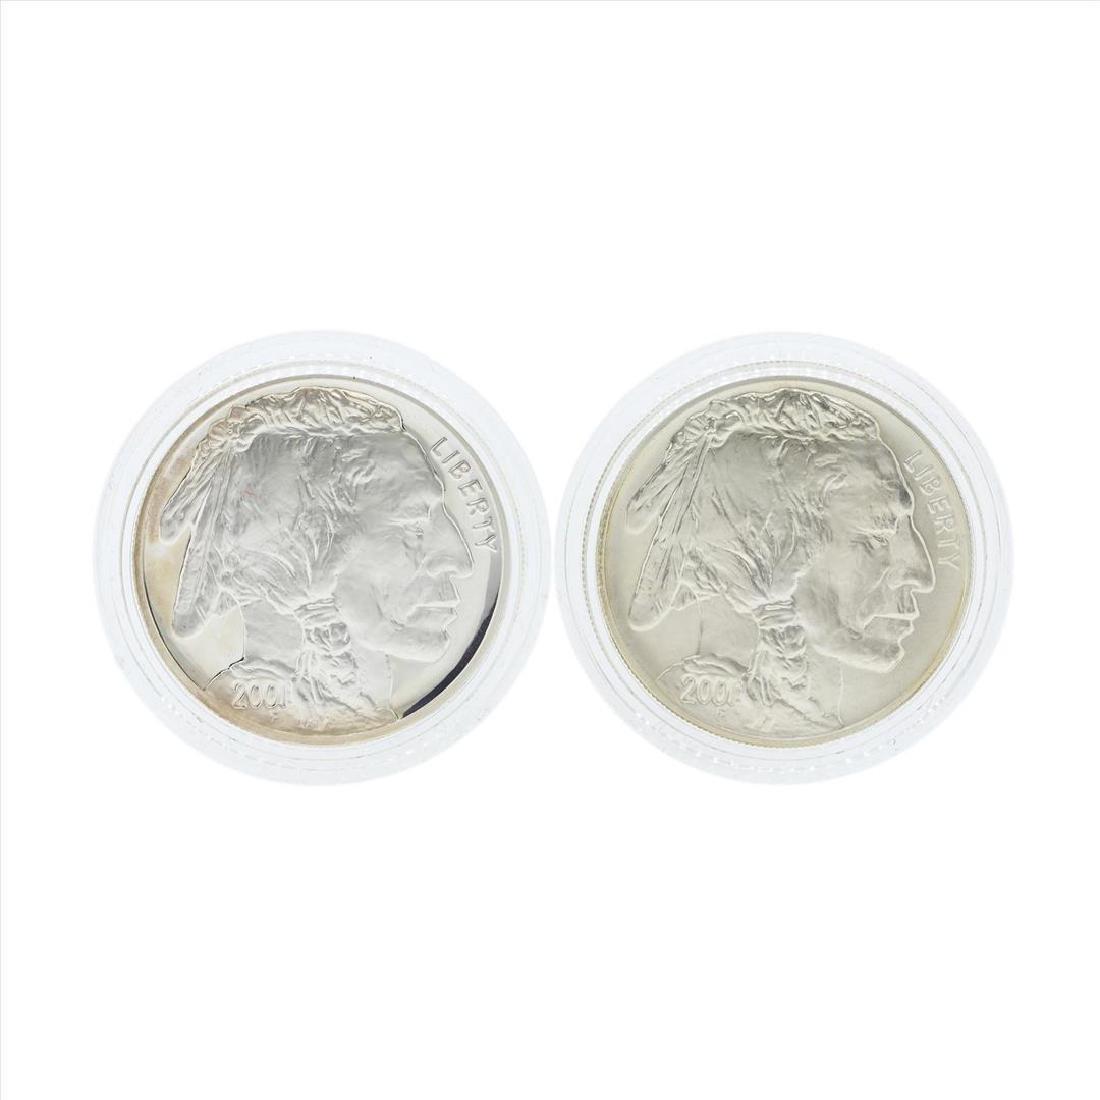 Set of (2) 2001 $1 American Buffalo Commemorative